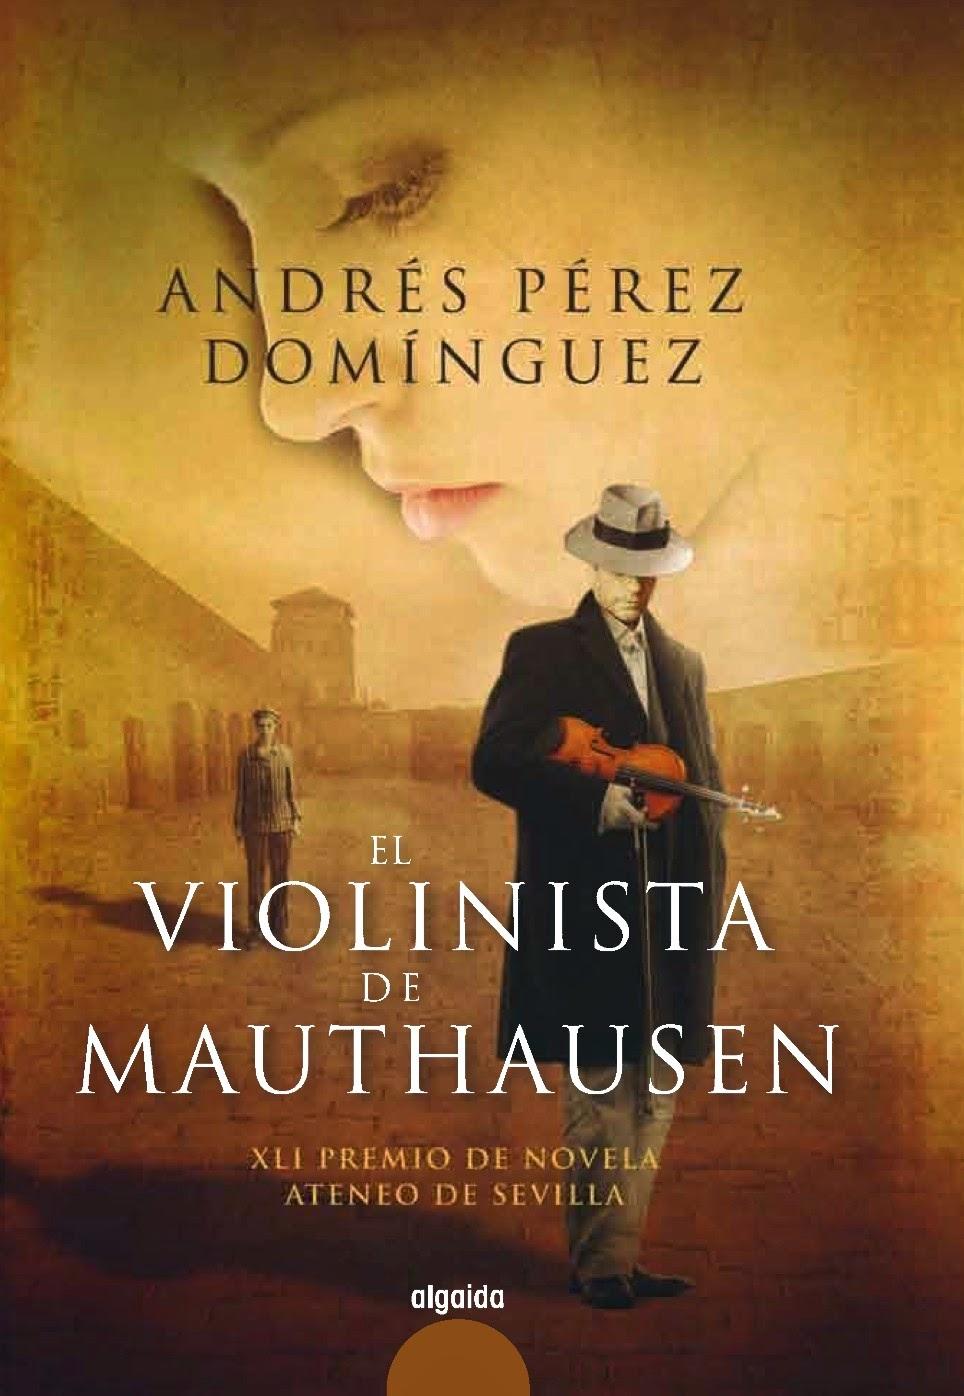 http://labibliotecadebella.blogspot.com.es/2014/12/andres-perez-dominguez-el-violinista-de.html